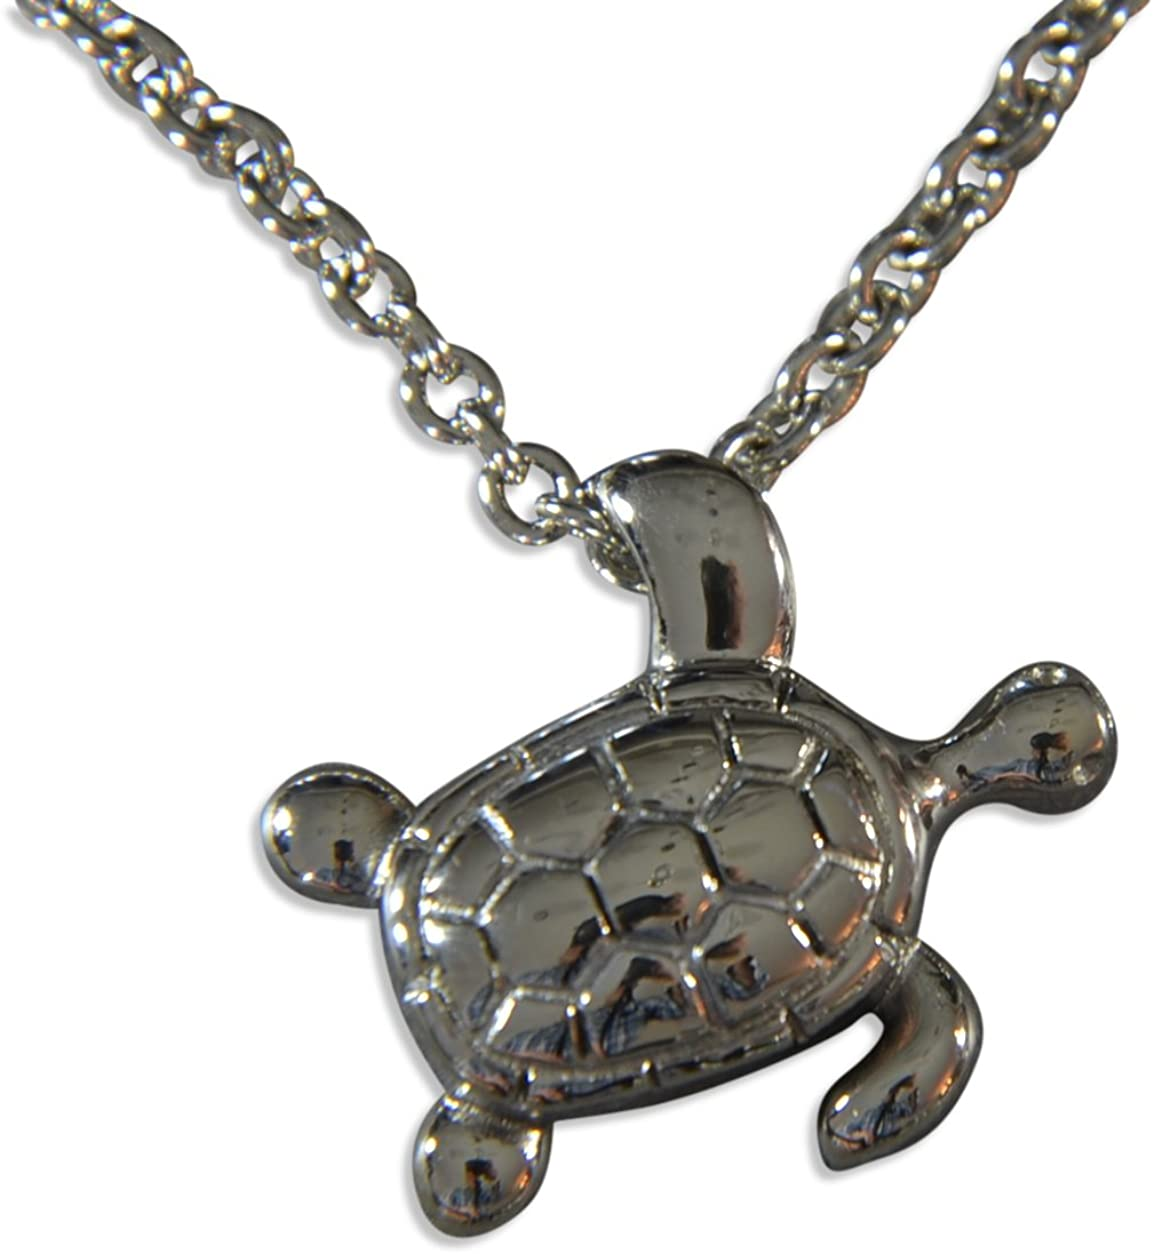 Gwen Delicious Silver Hanging Turtle Cremation Urn Necklace Secret Hidden Stash Pendant Locket Memorial Keepsake Jewelry (16 Inches)